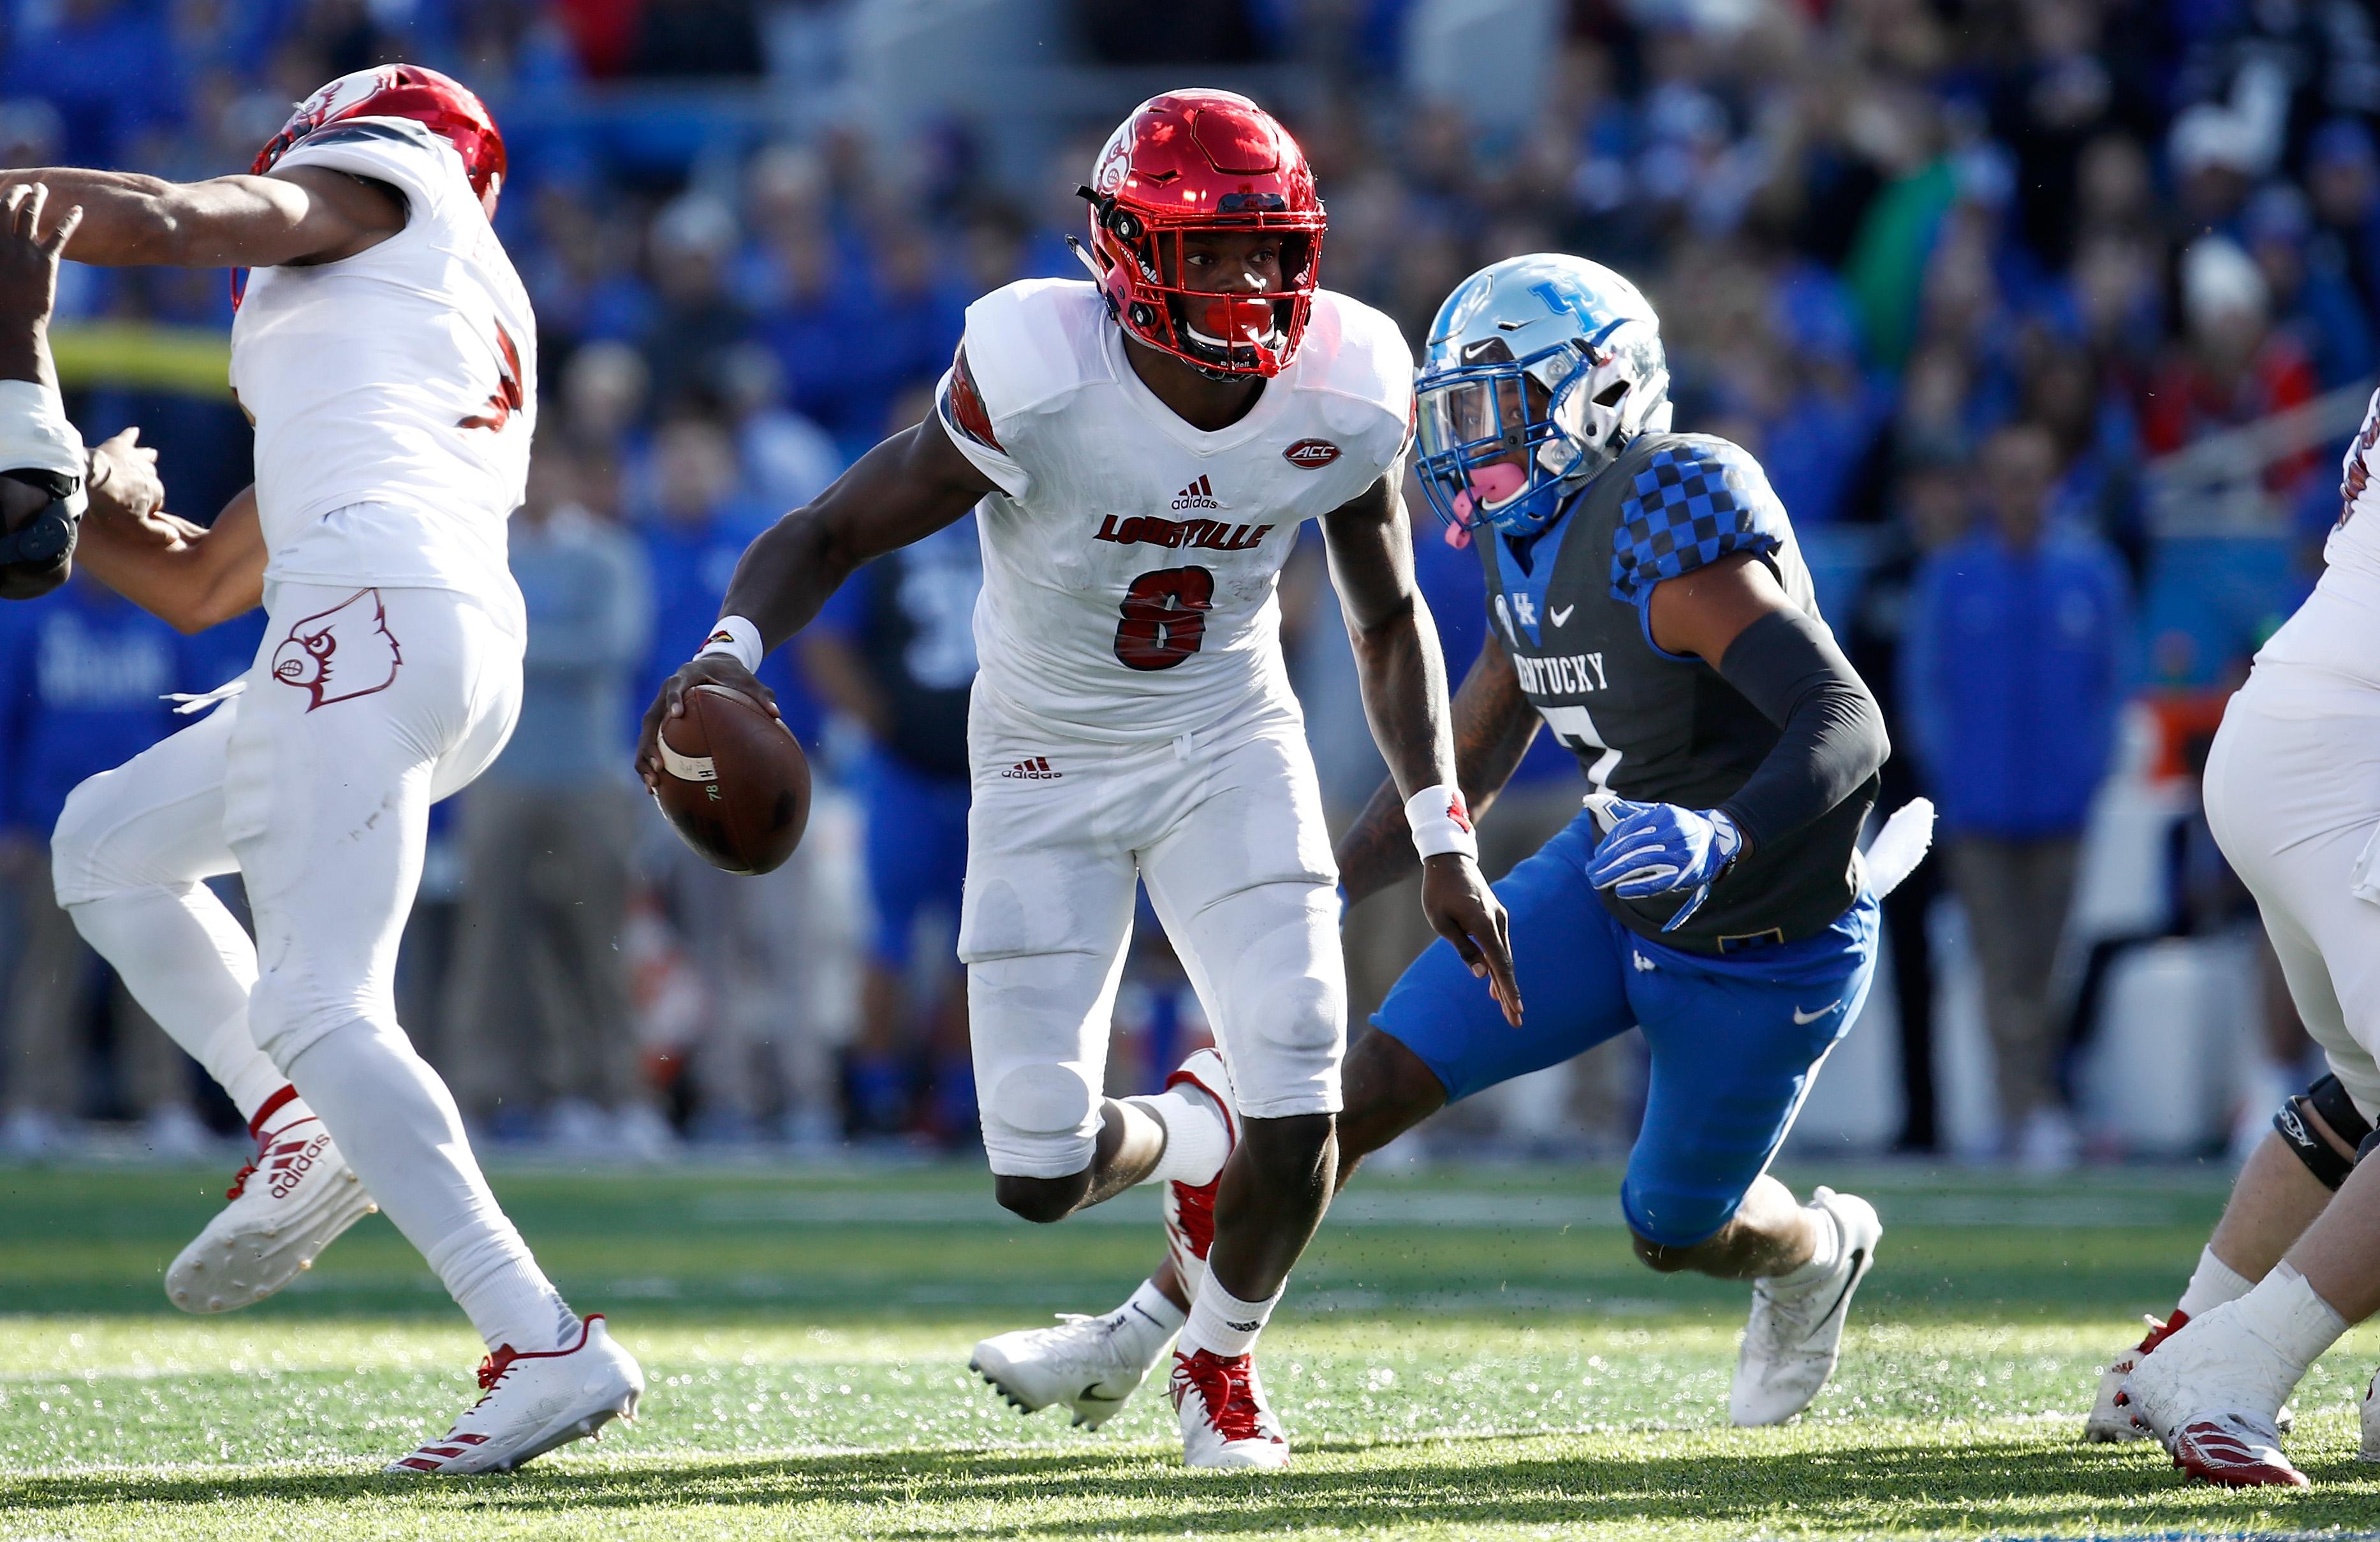 Louisville QB Lamar Jackson